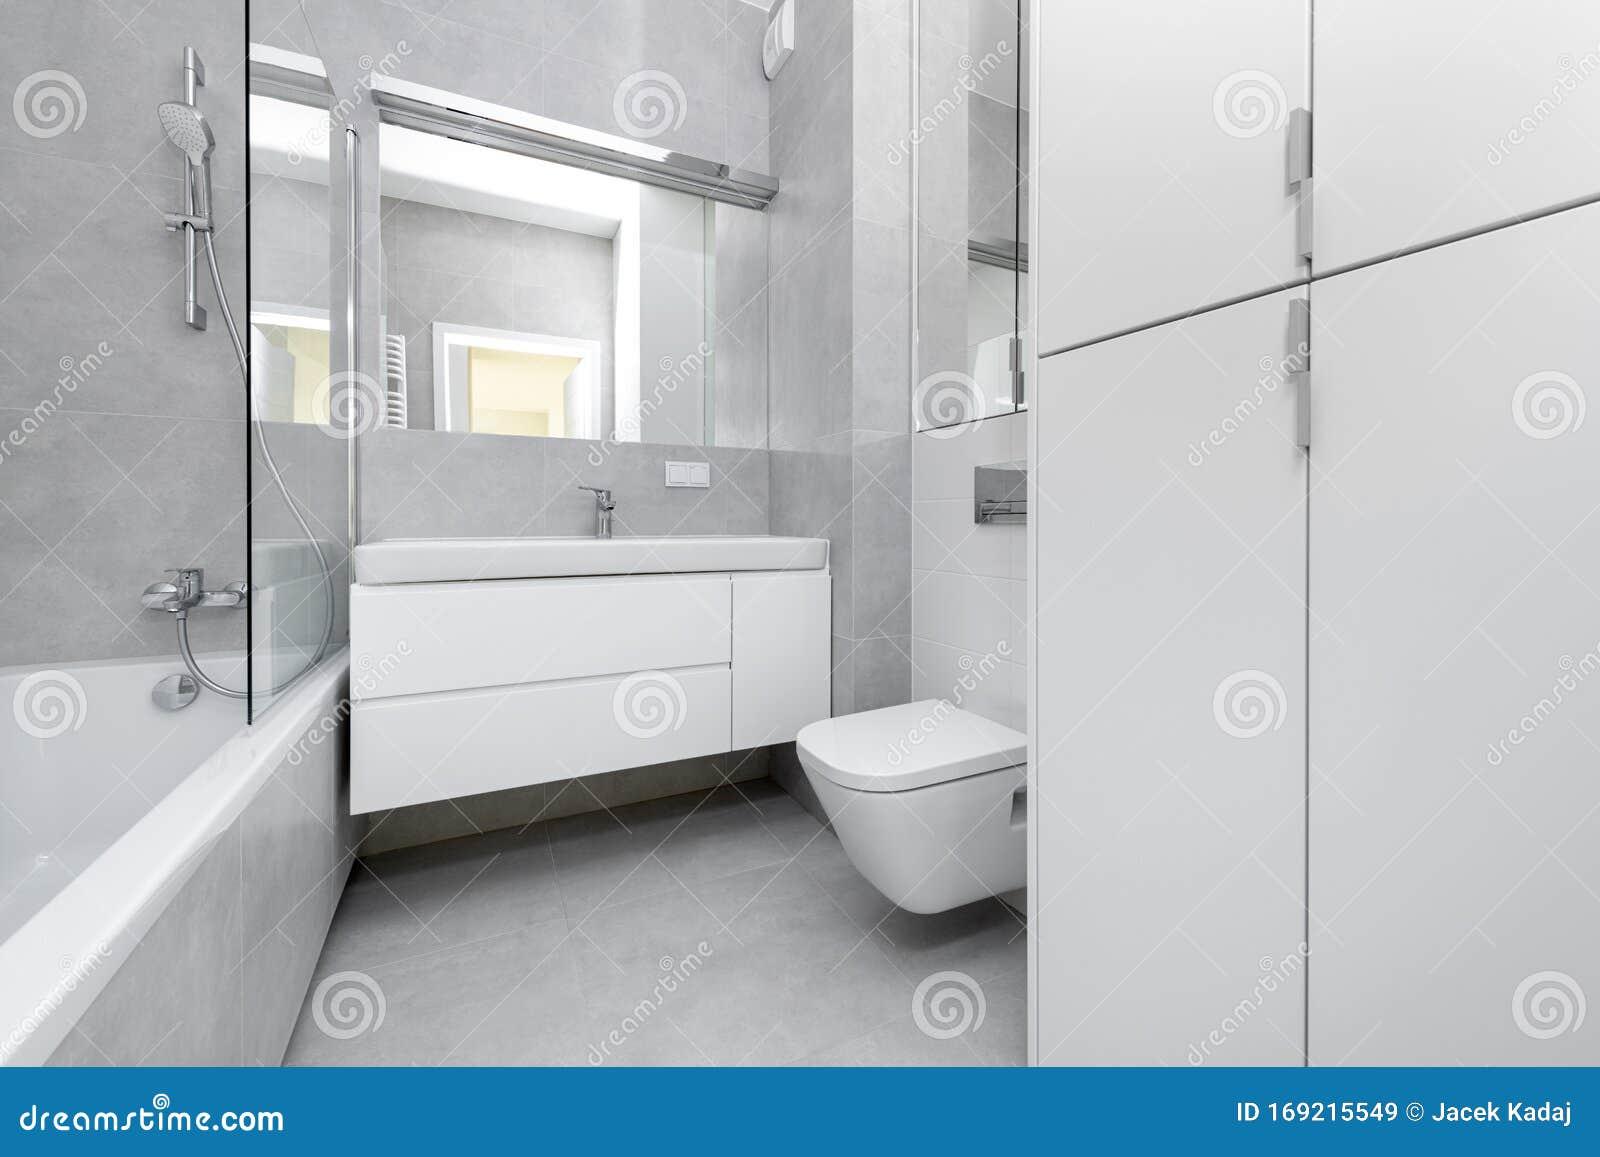 Modern Interior Design Bathroom Stock Image Image Of Elegance Home 169215549